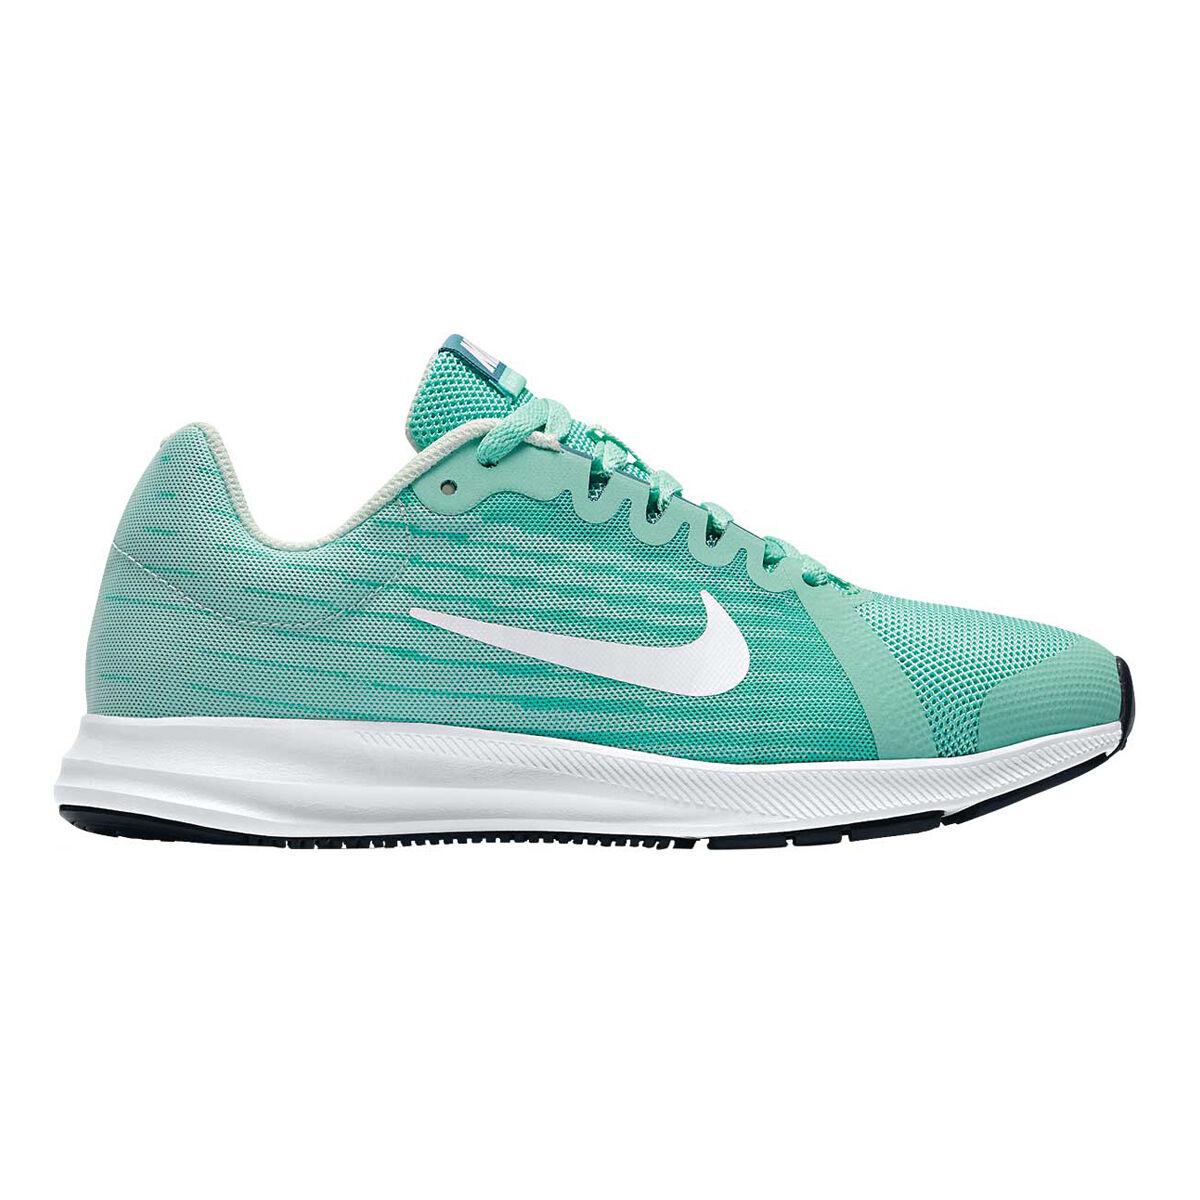 Nike Downshifter 8 Girls Running Shoes Green White US 7